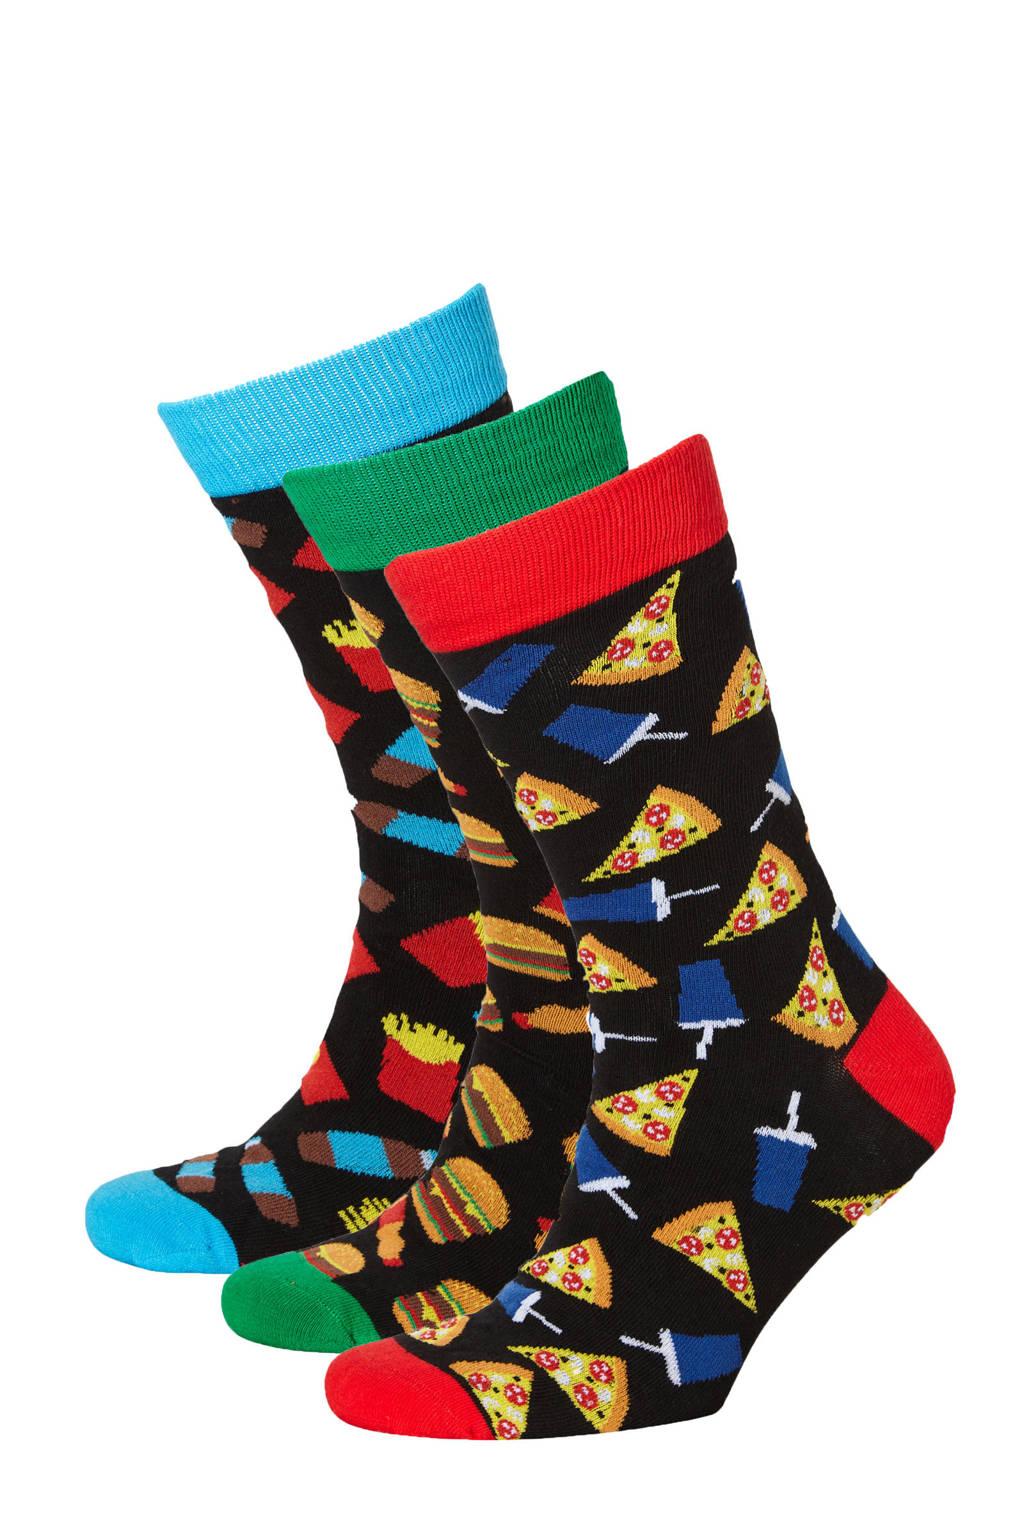 Apollo giftbox sokken - set van 3 zwart/multi, Zwart/multi